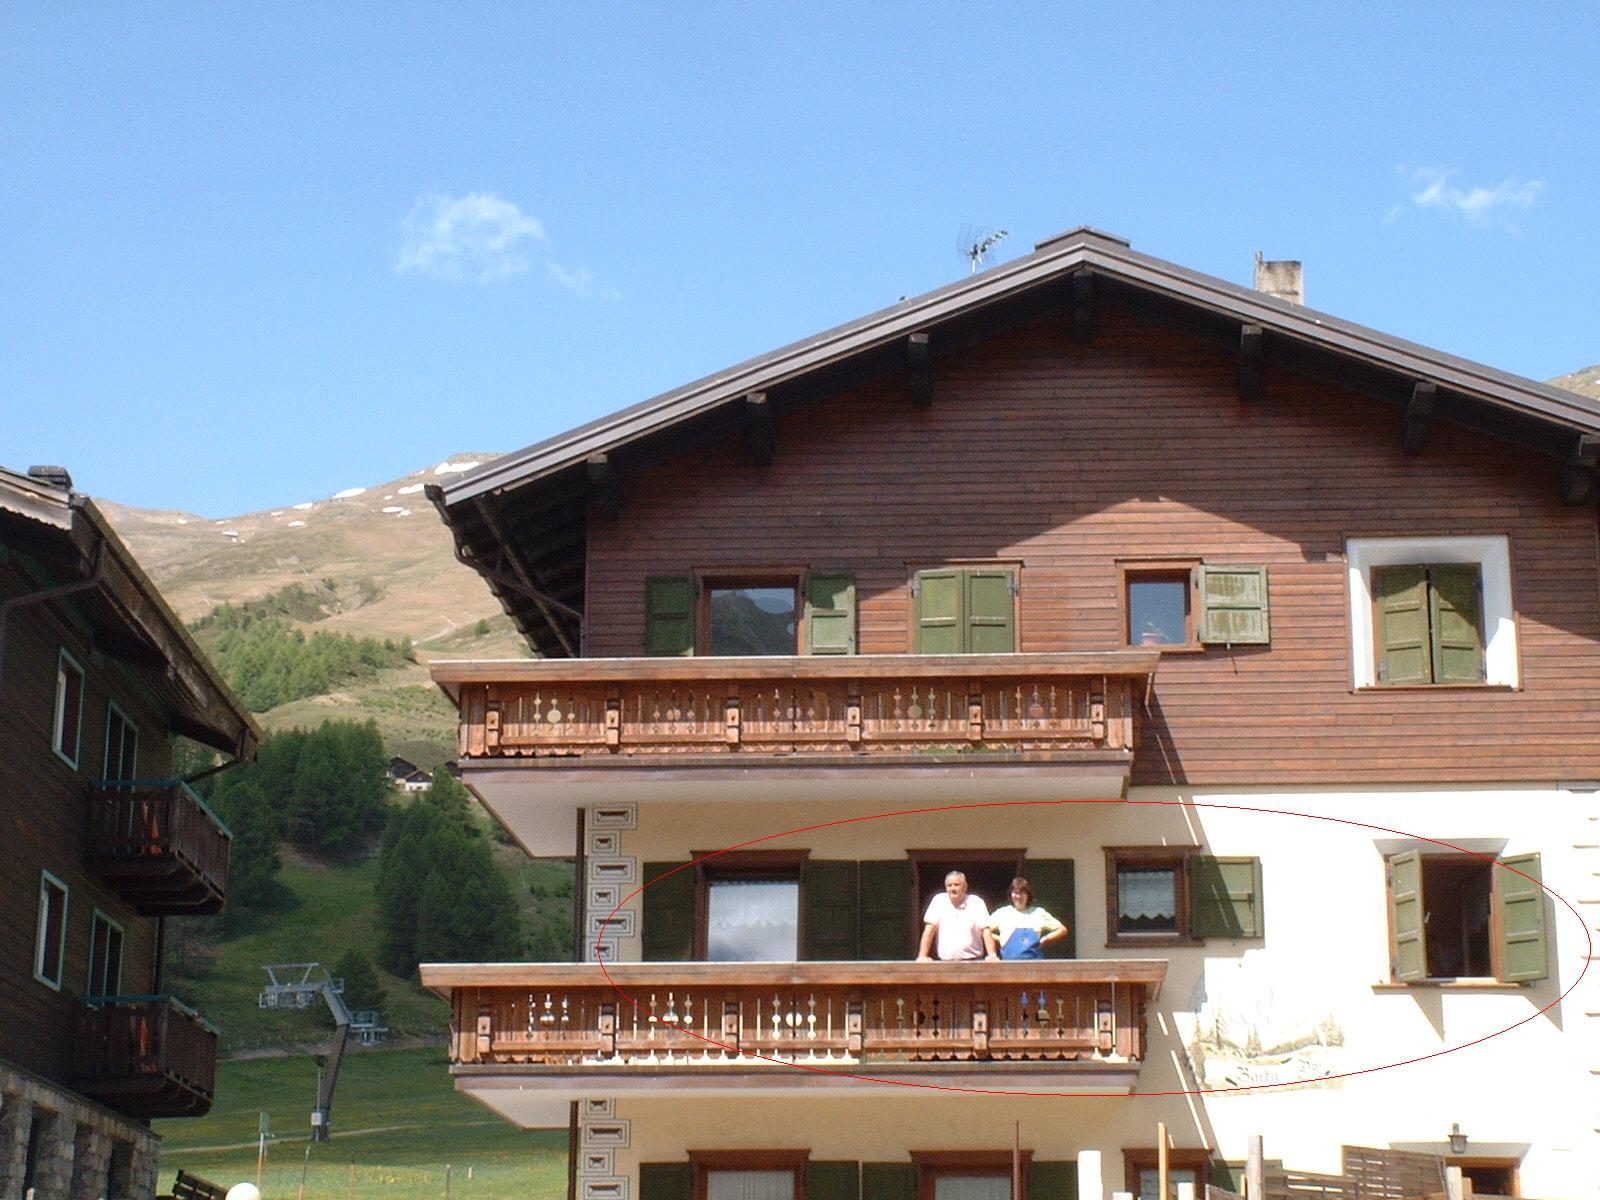 Affitto appartamento montagna livigno